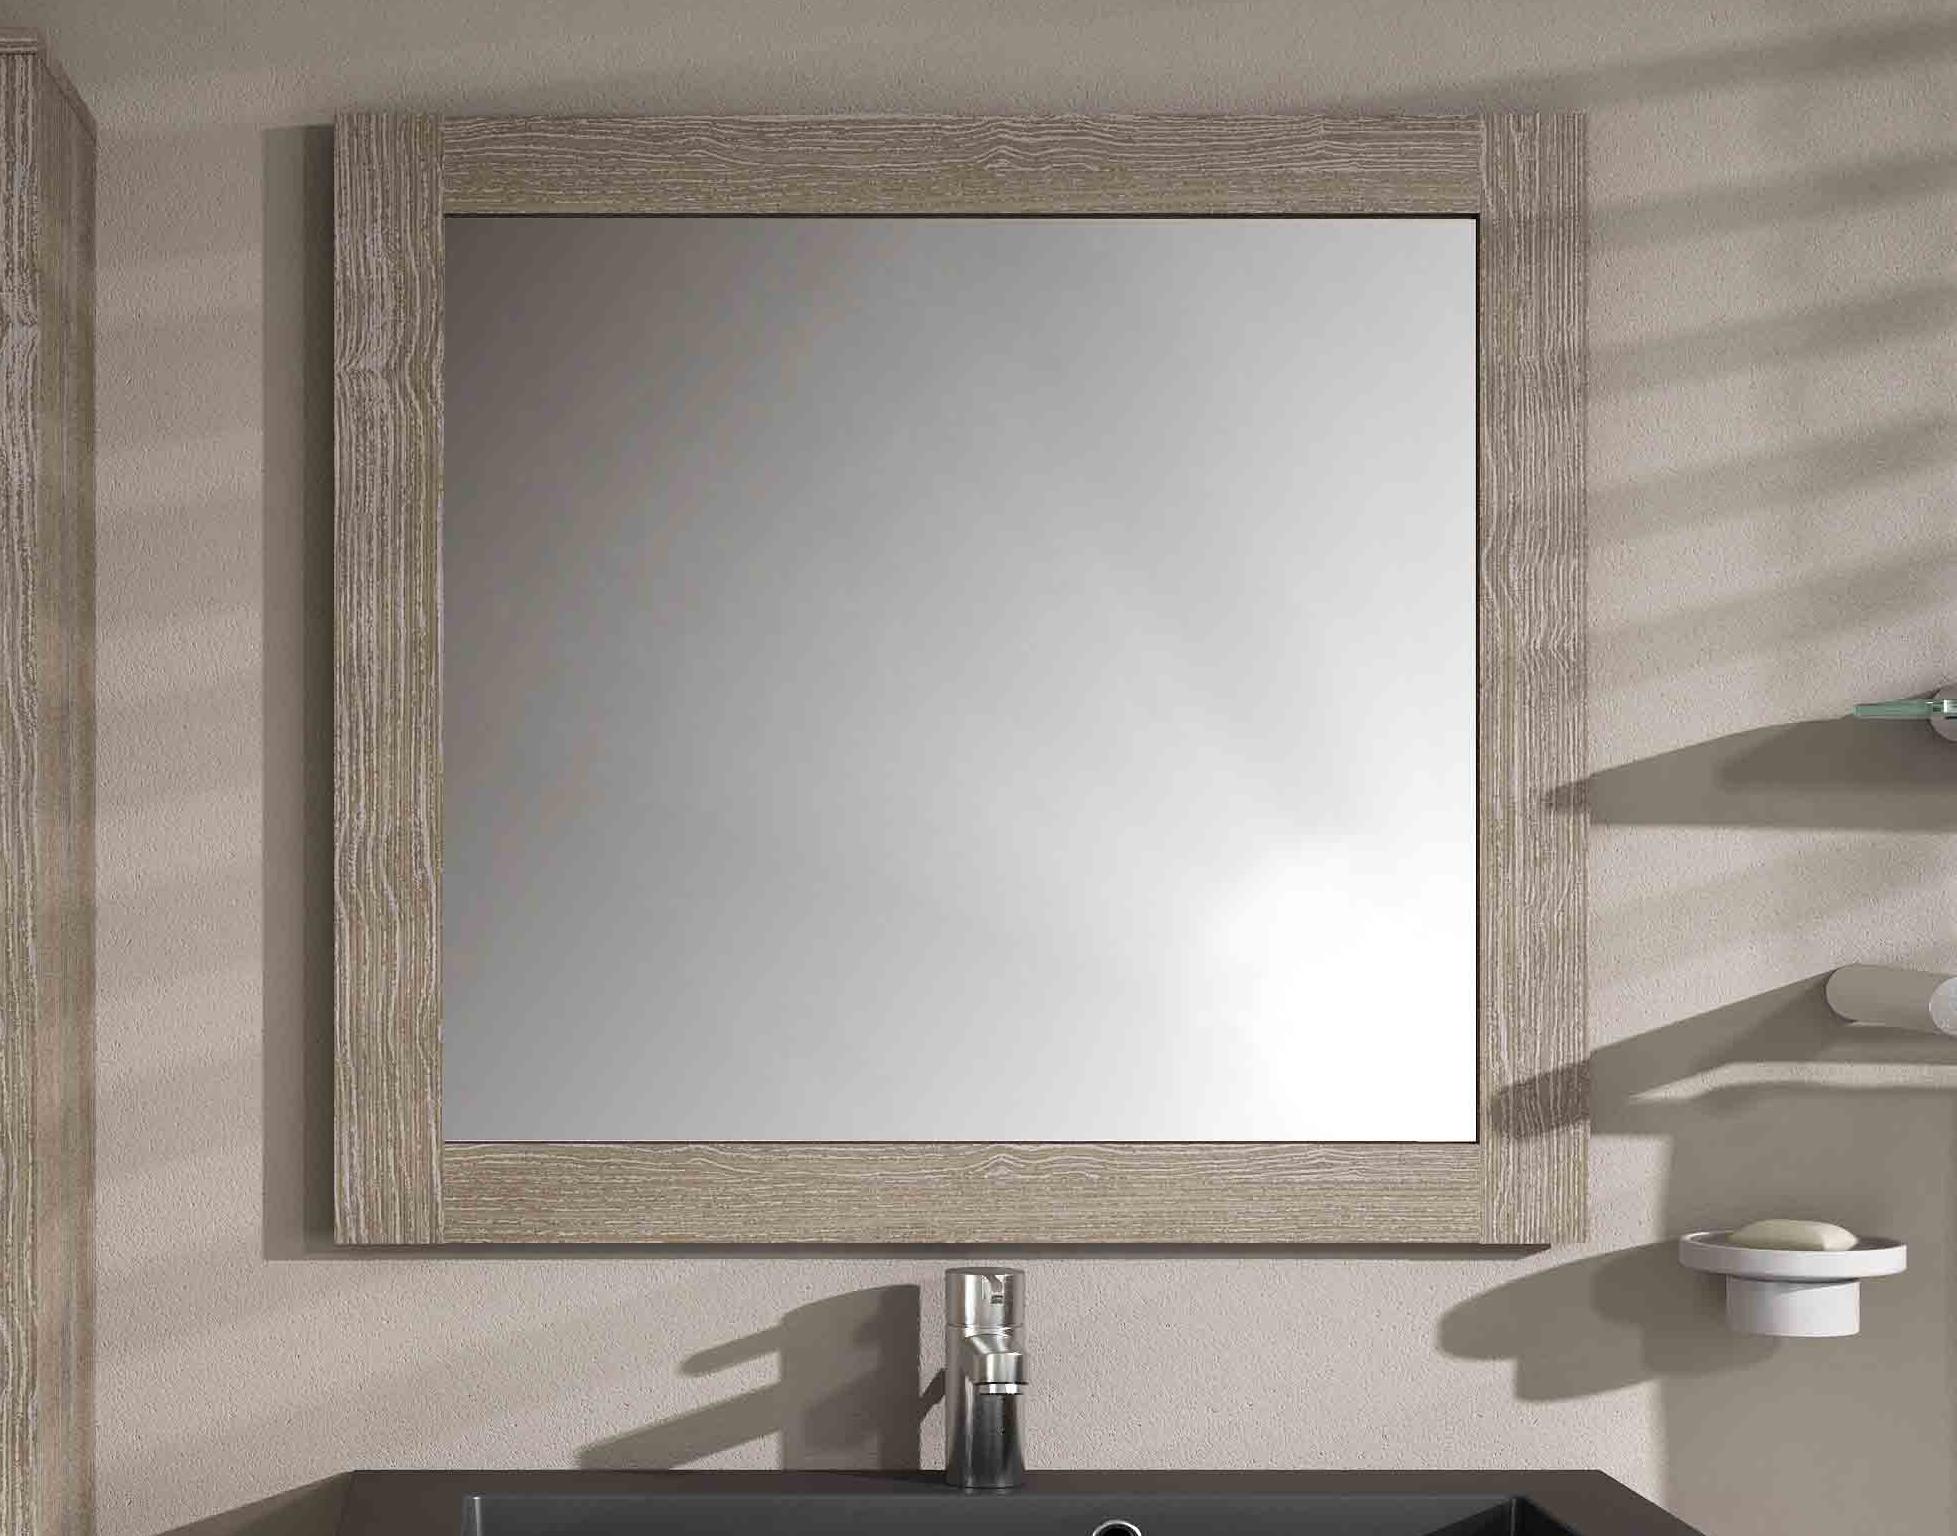 Miroir cadre miroir cadre coventry aquarine pro for Miroir hd pro